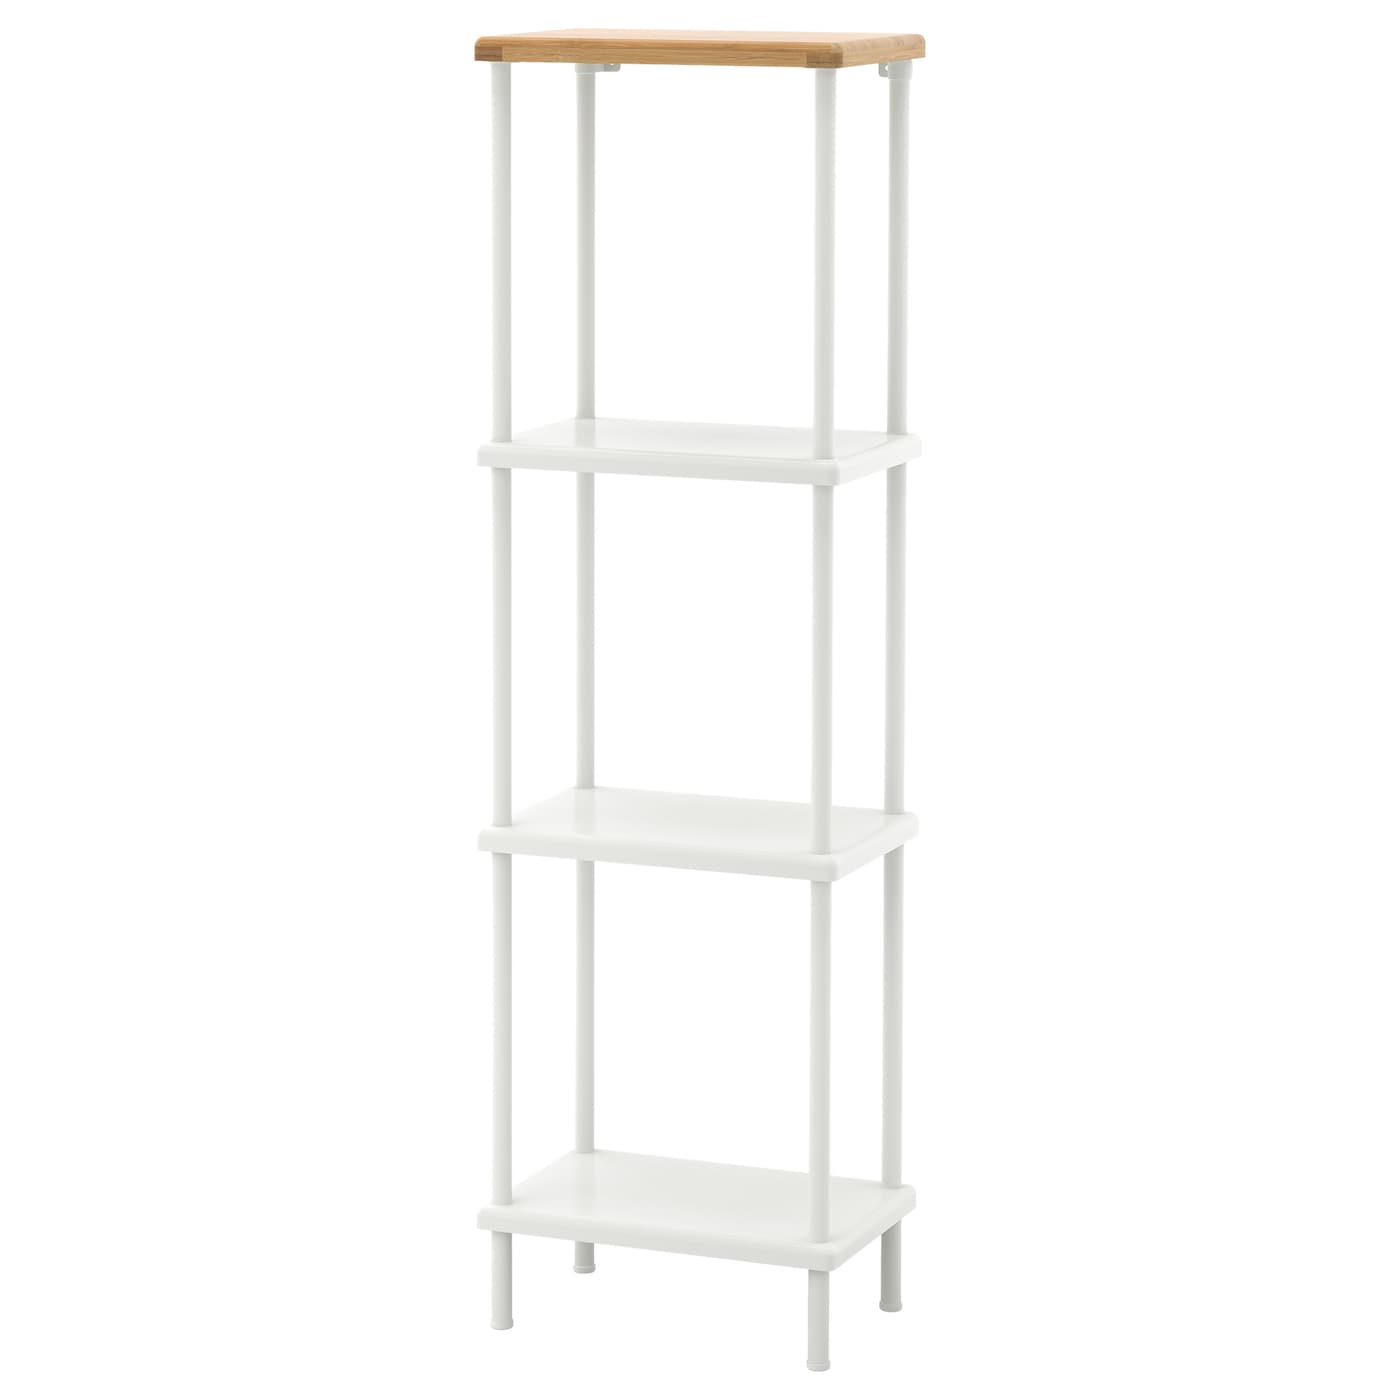 Bathroom storage bathroom storage ideas ikea for Ikea shelving